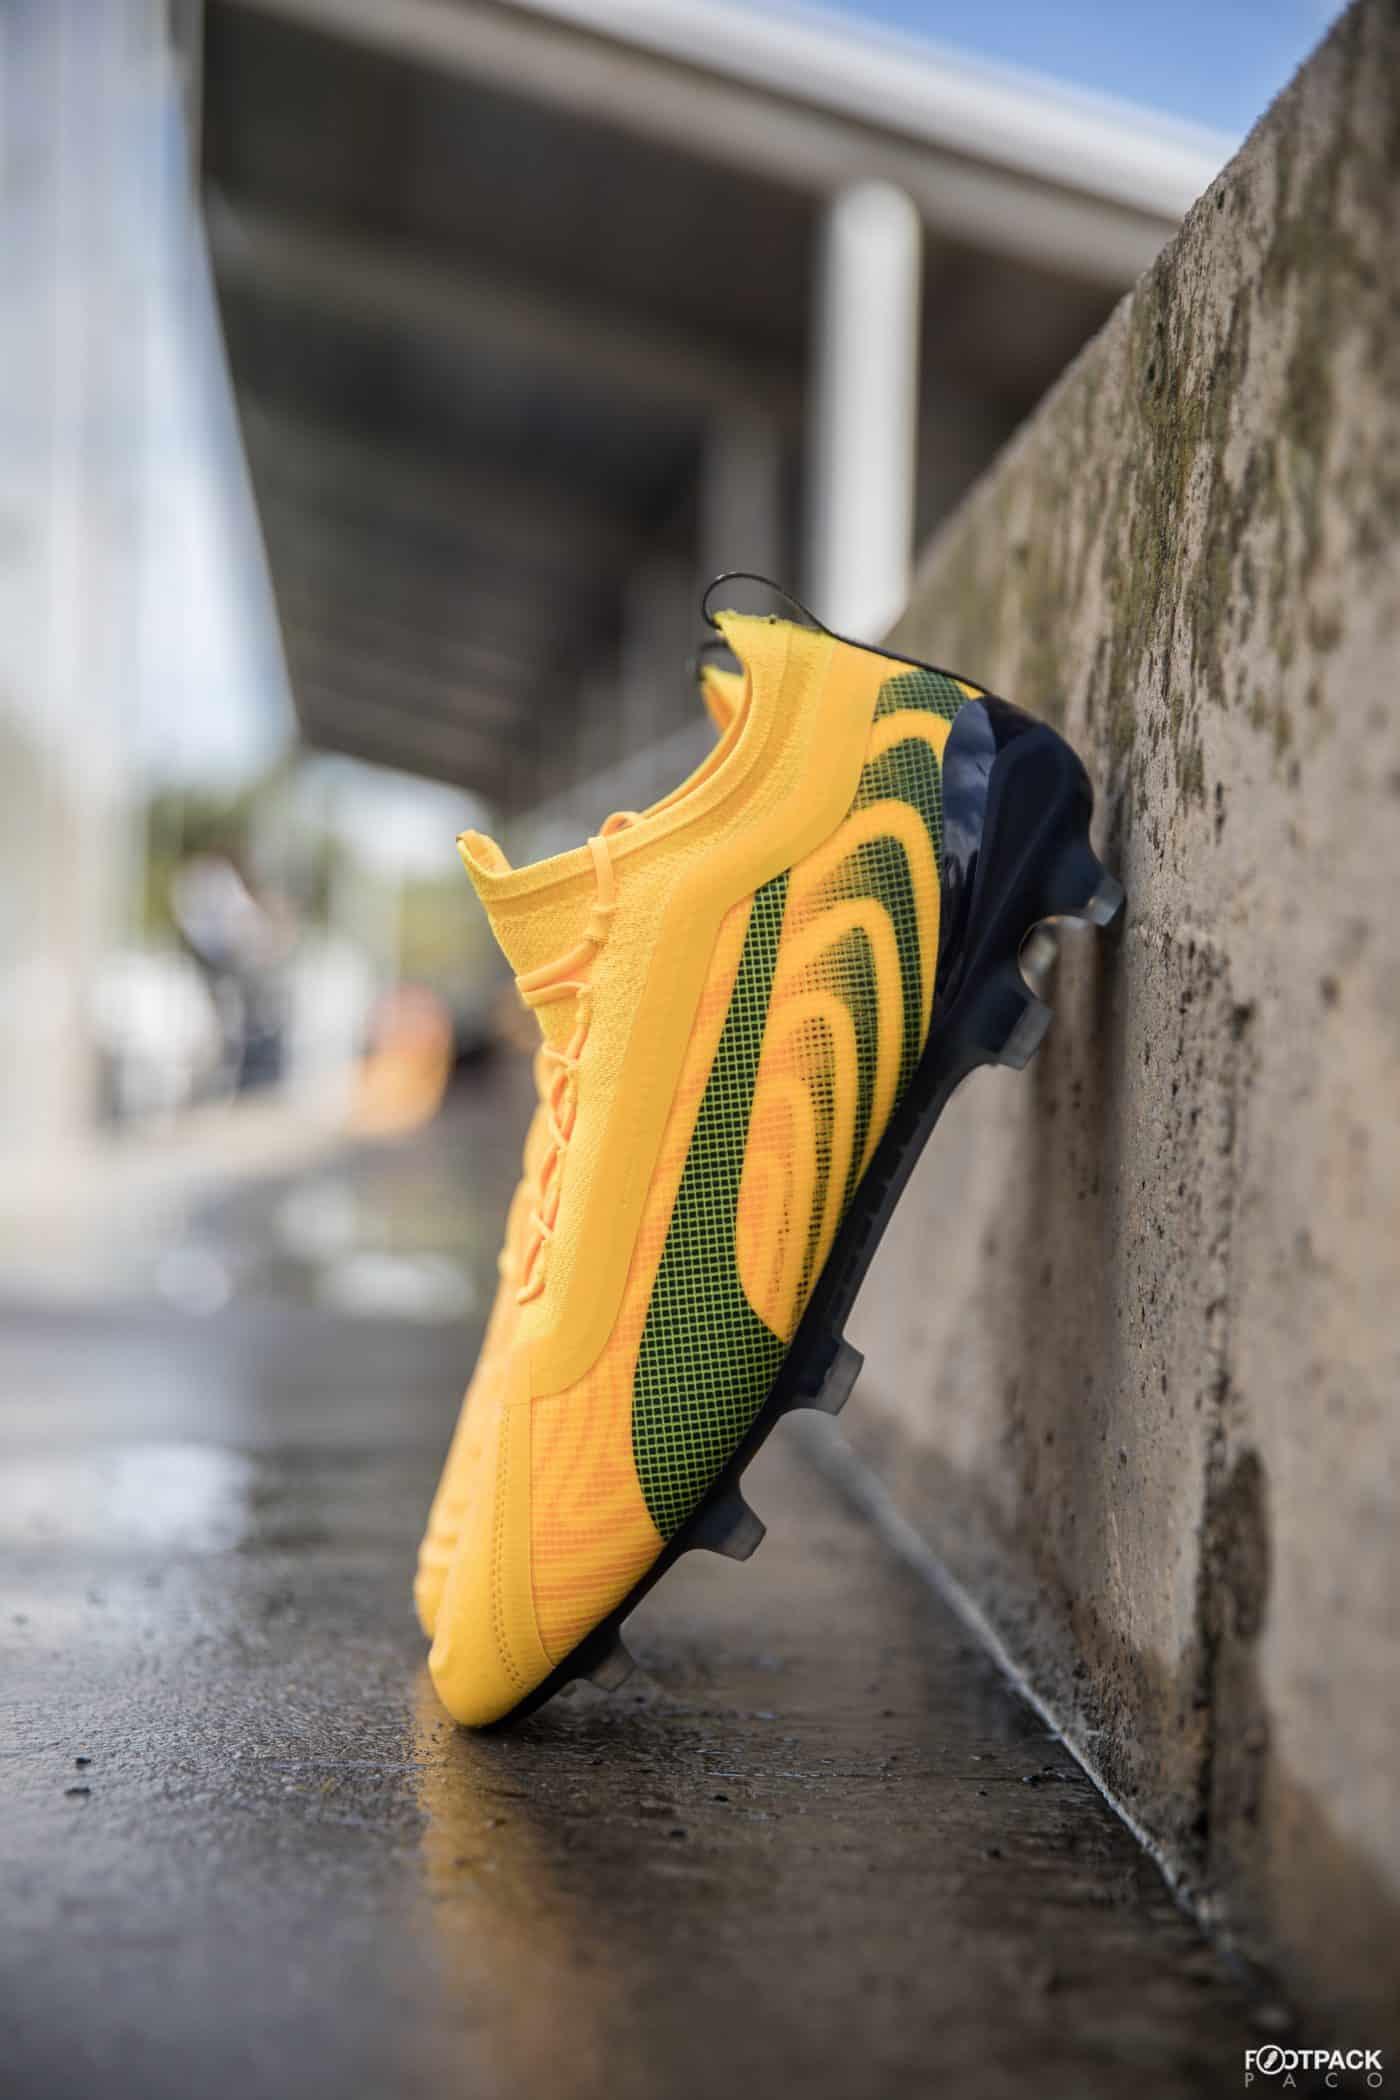 chaussures-de-foot-puma-one-5.1-spark-janvier-2020-footpack-2